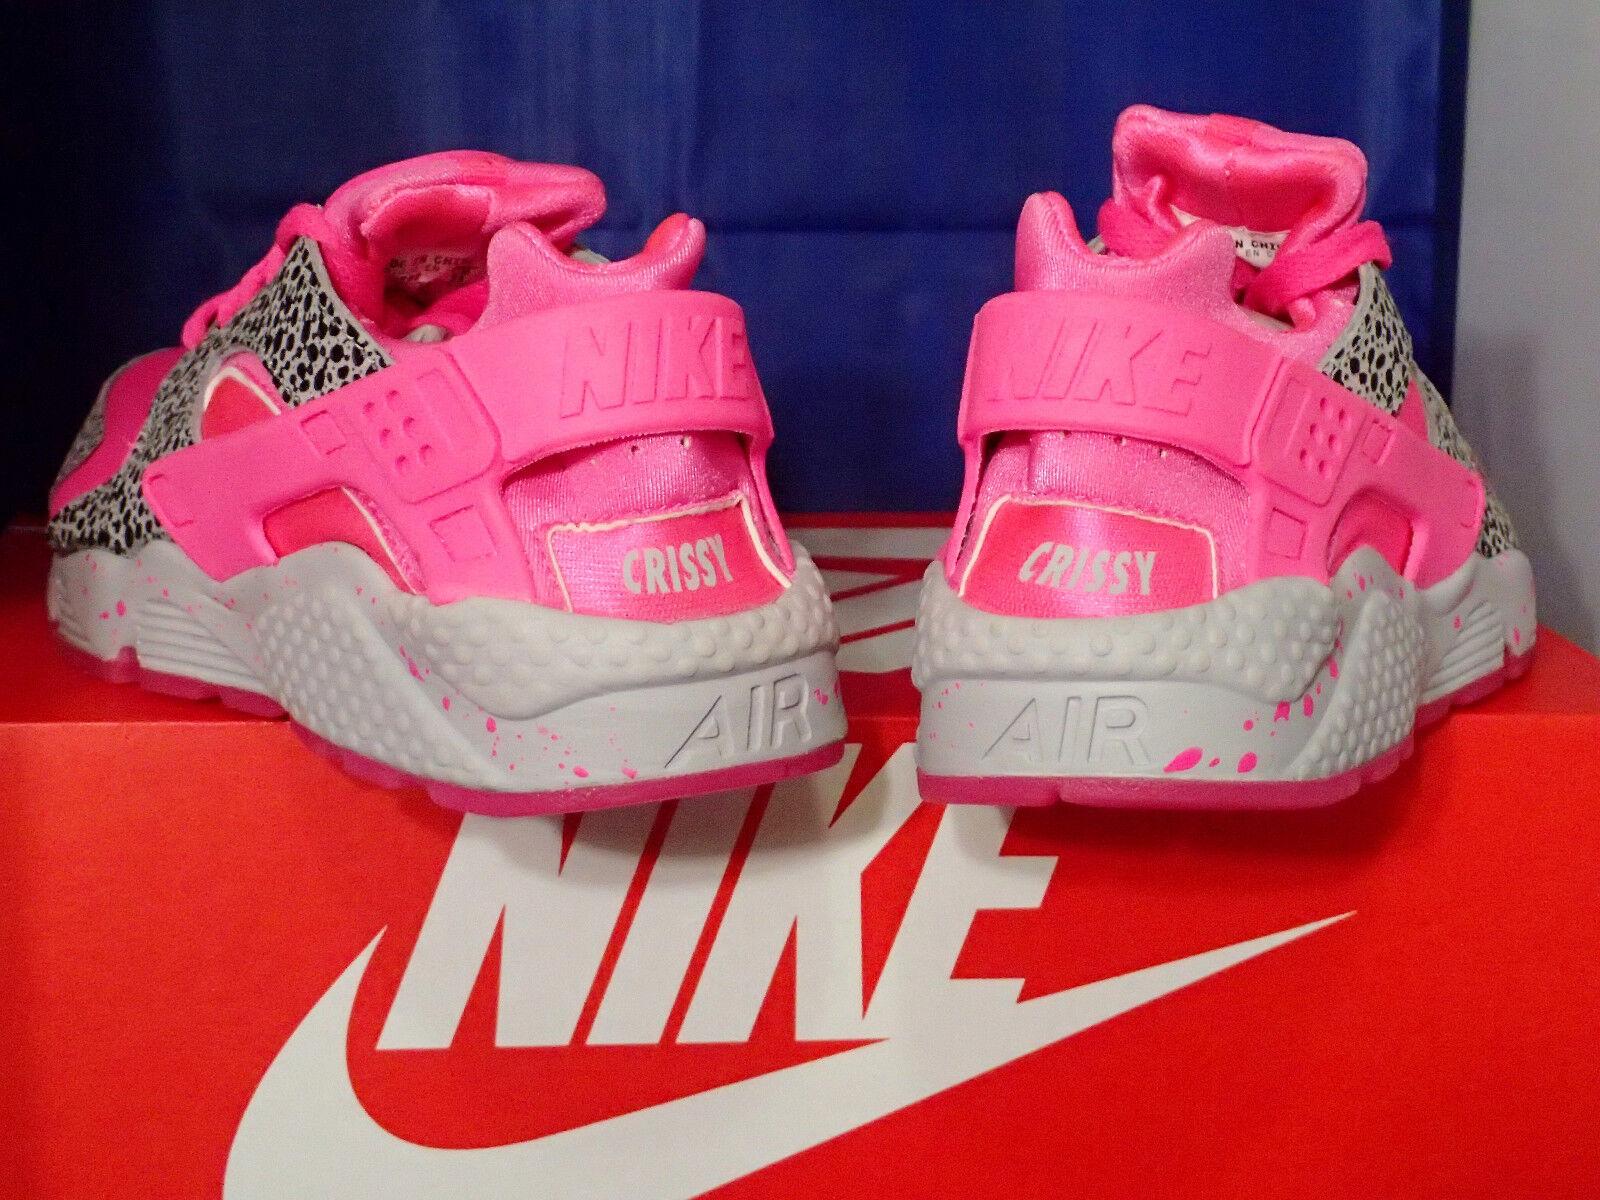 Damen Nike Luft Huarache Run Identifikation Safari Grau Pink Pow Cool Grau Safari Sz 6 5227e4